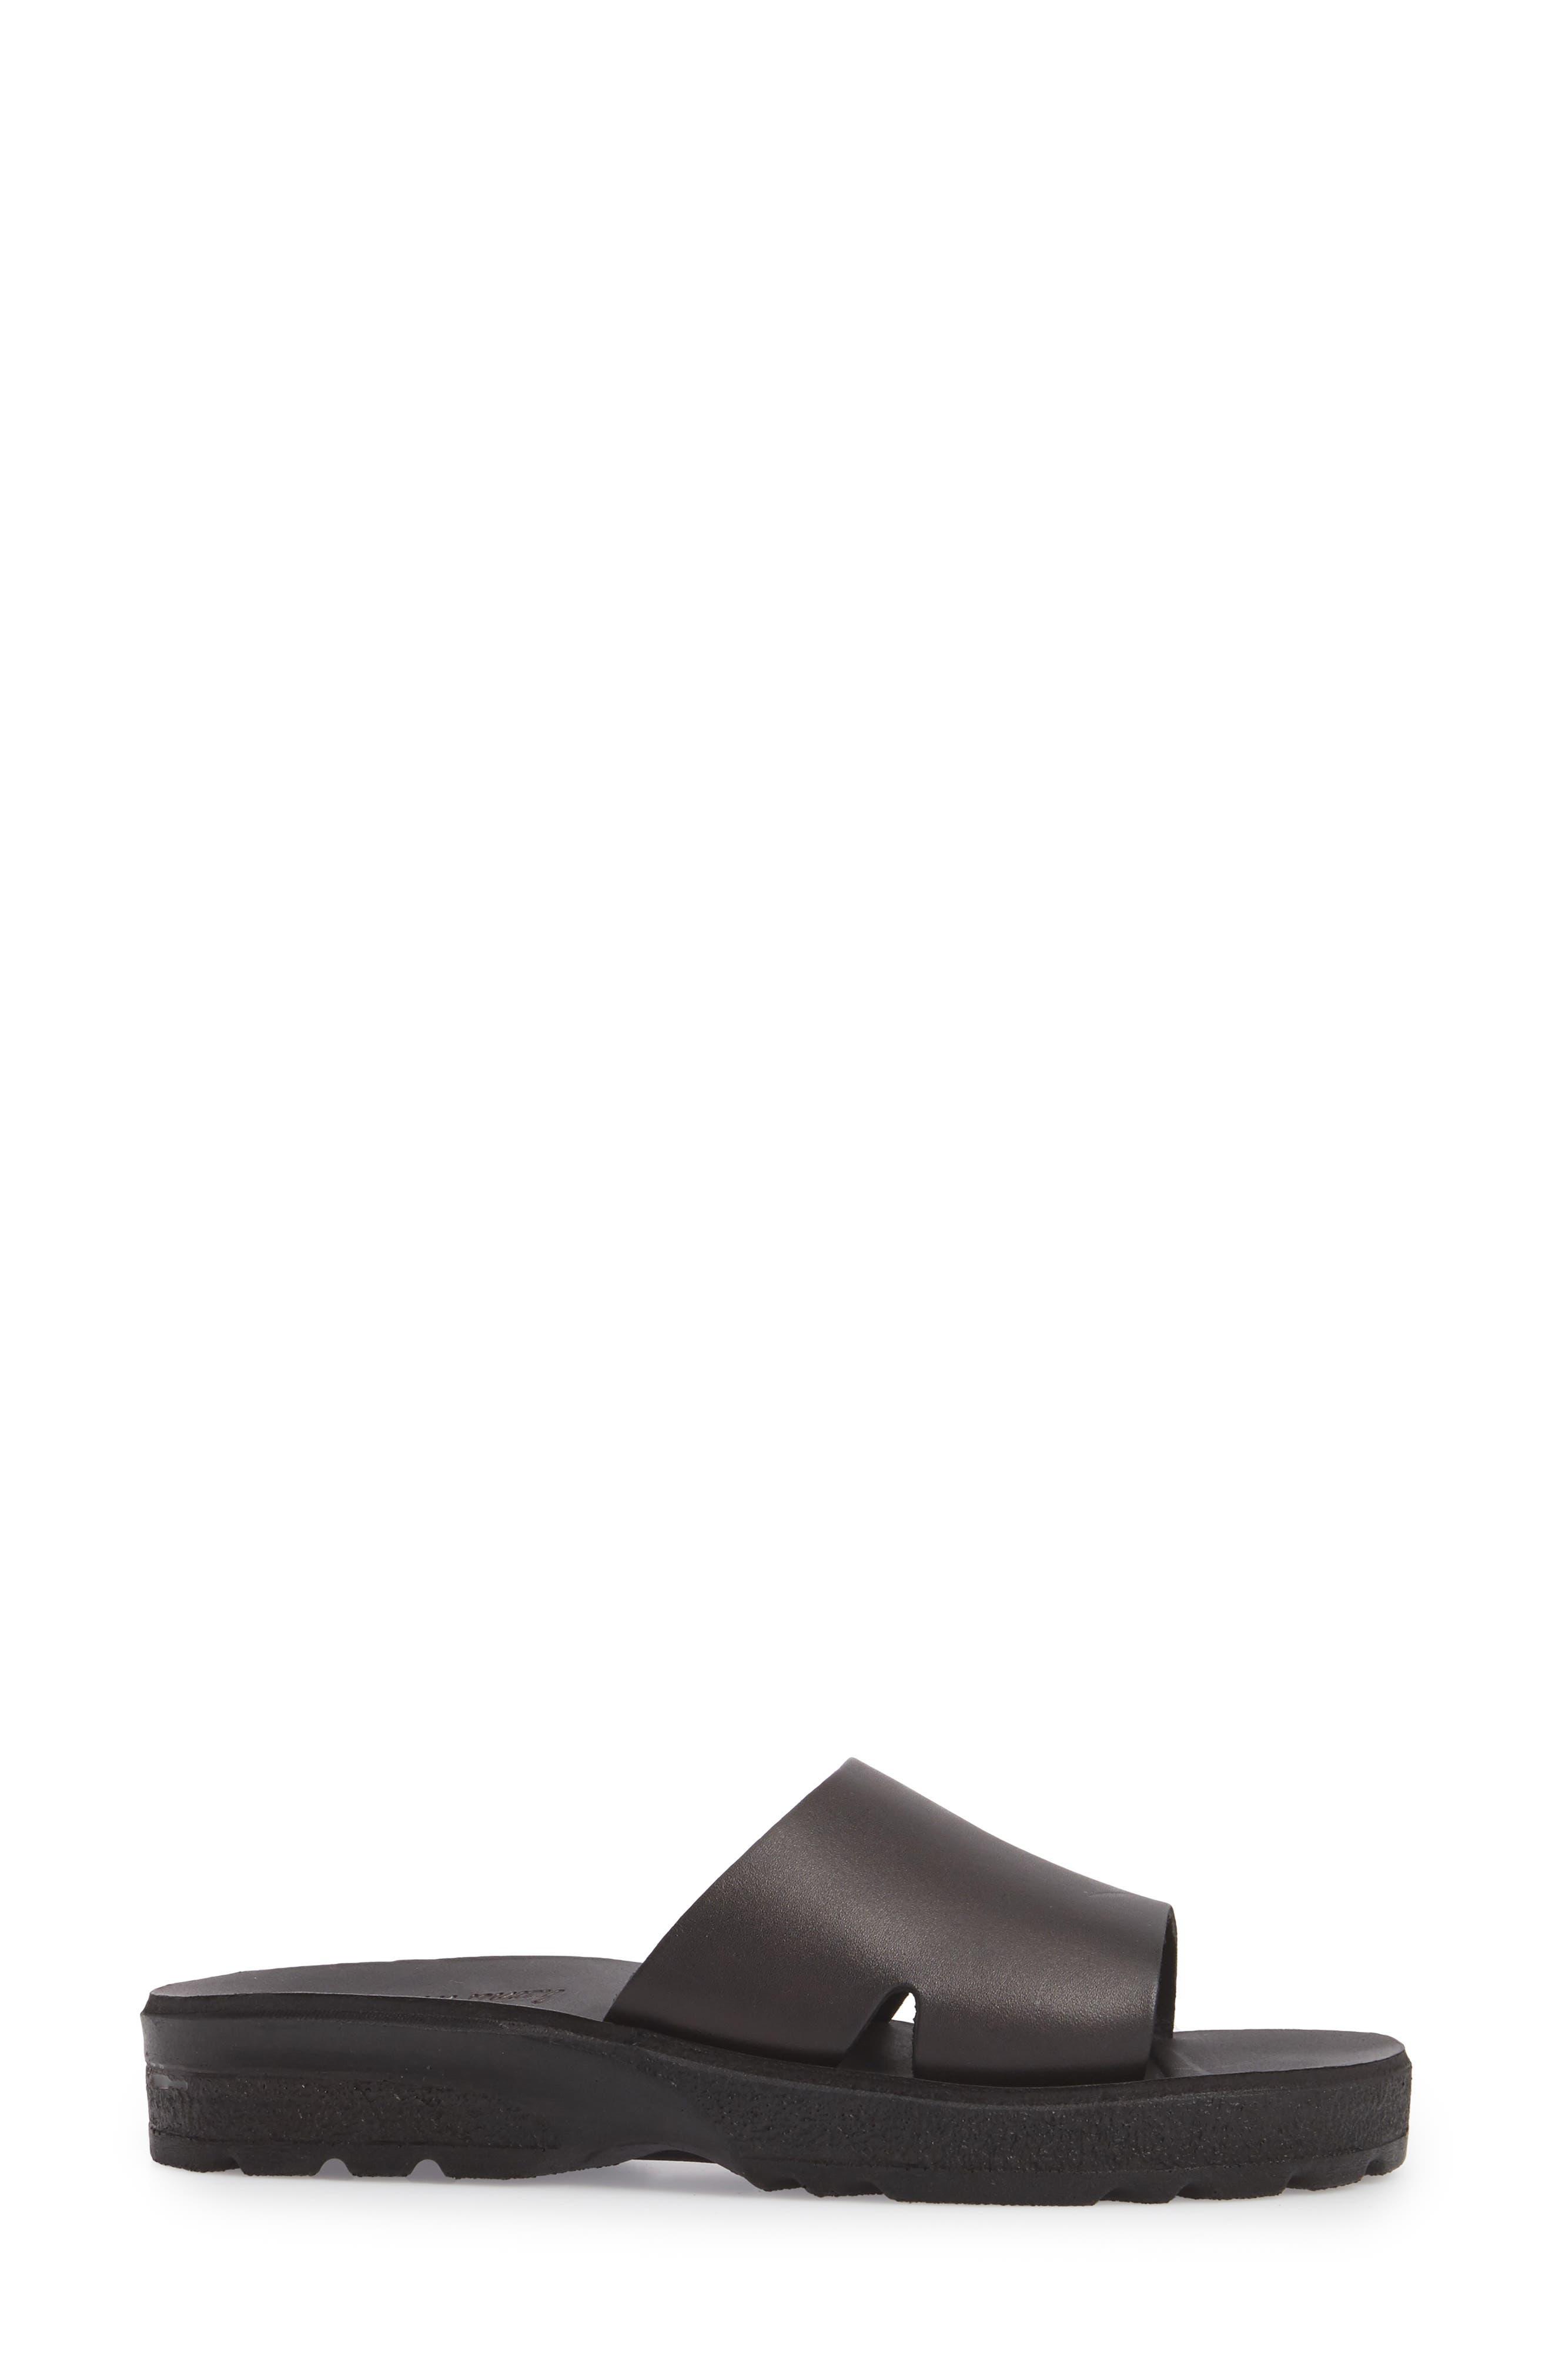 Bashn Molded Footbed Slide Sandal,                             Alternate thumbnail 3, color,                             BLACK LEATHER